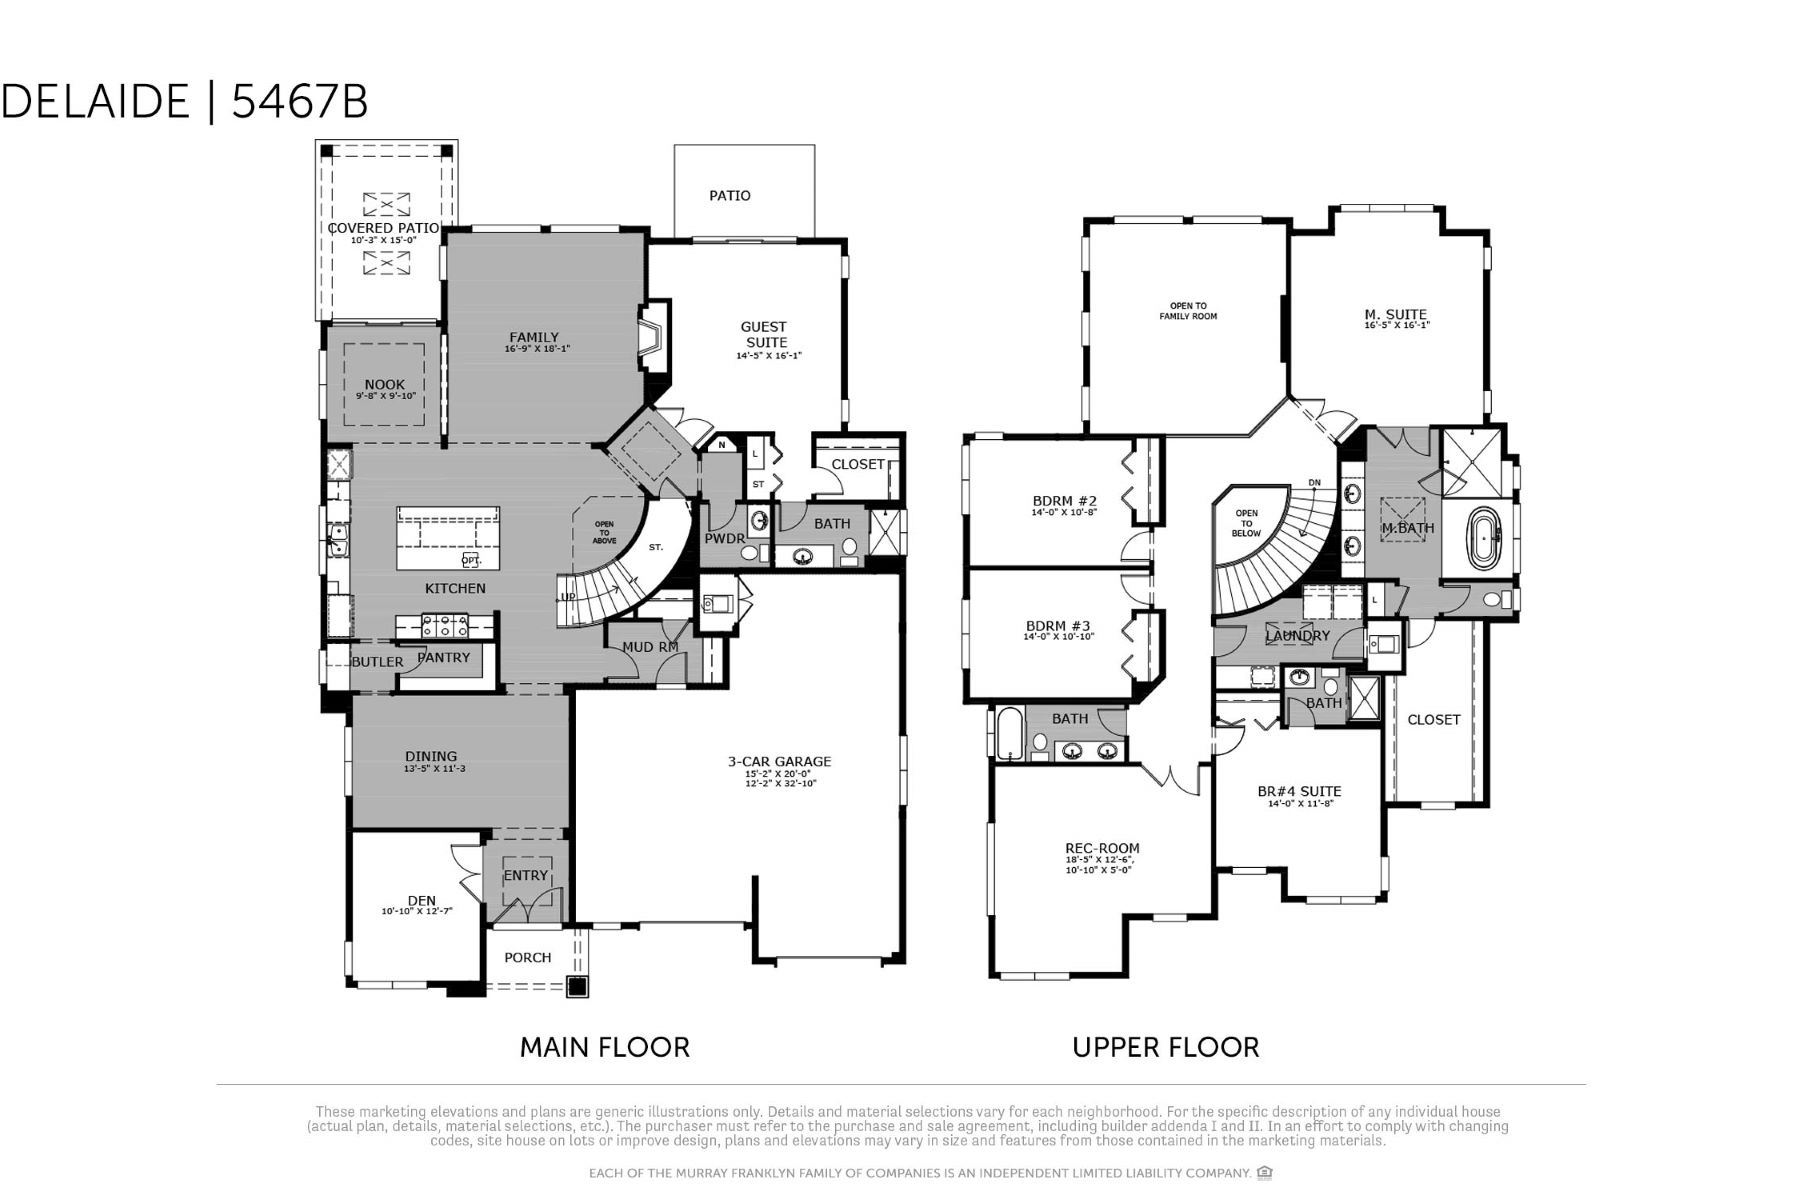 Single Family Homes for Sale at 5535 114th Avenue Northeast, Kirkland, WA 98033 5535 114th Ave NE Kirkland, Washington 98033 United States